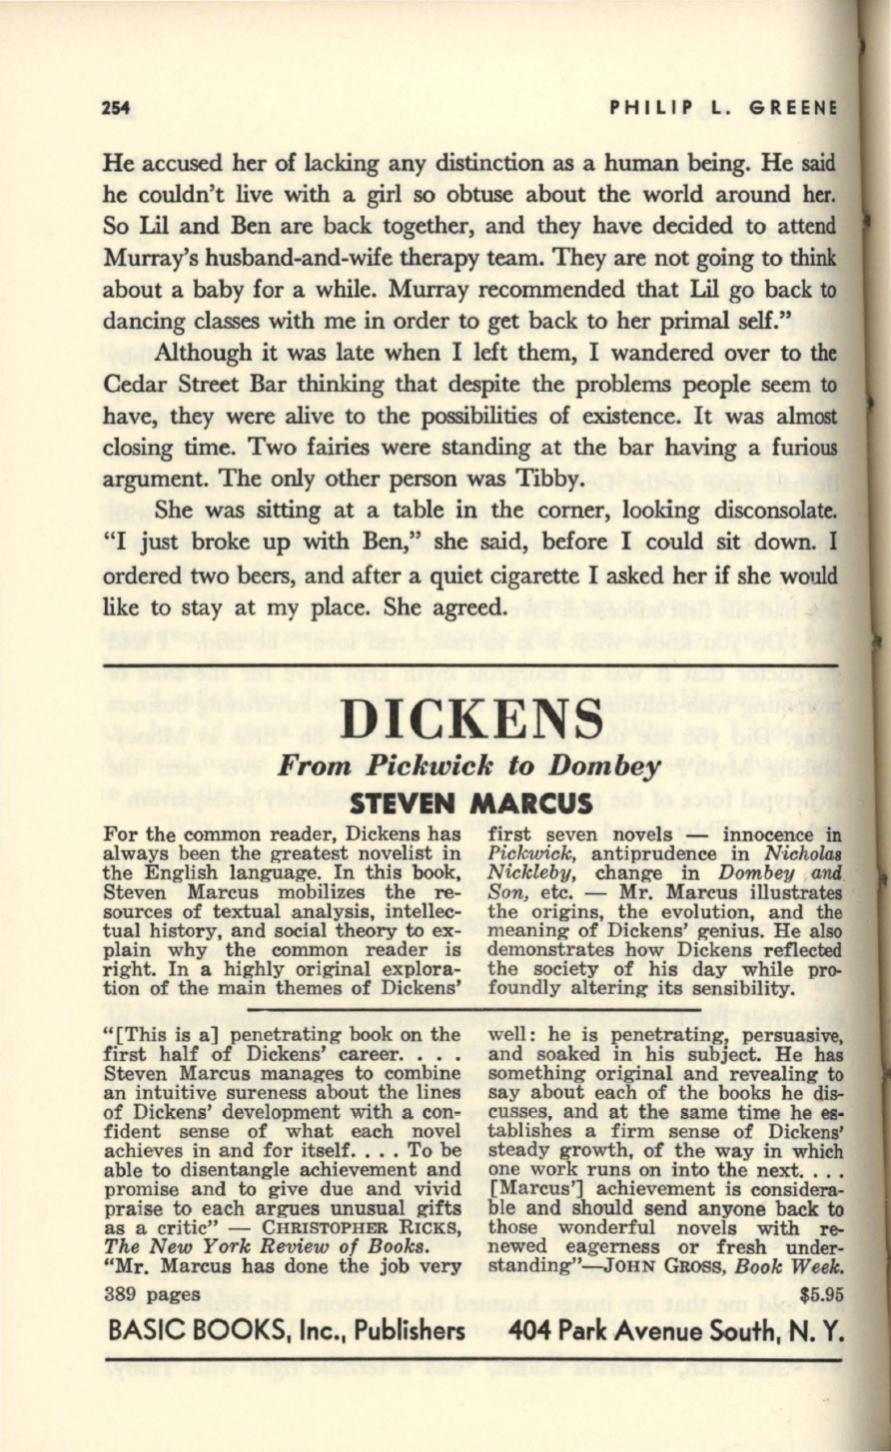 Vol. 32 No. 2 1965